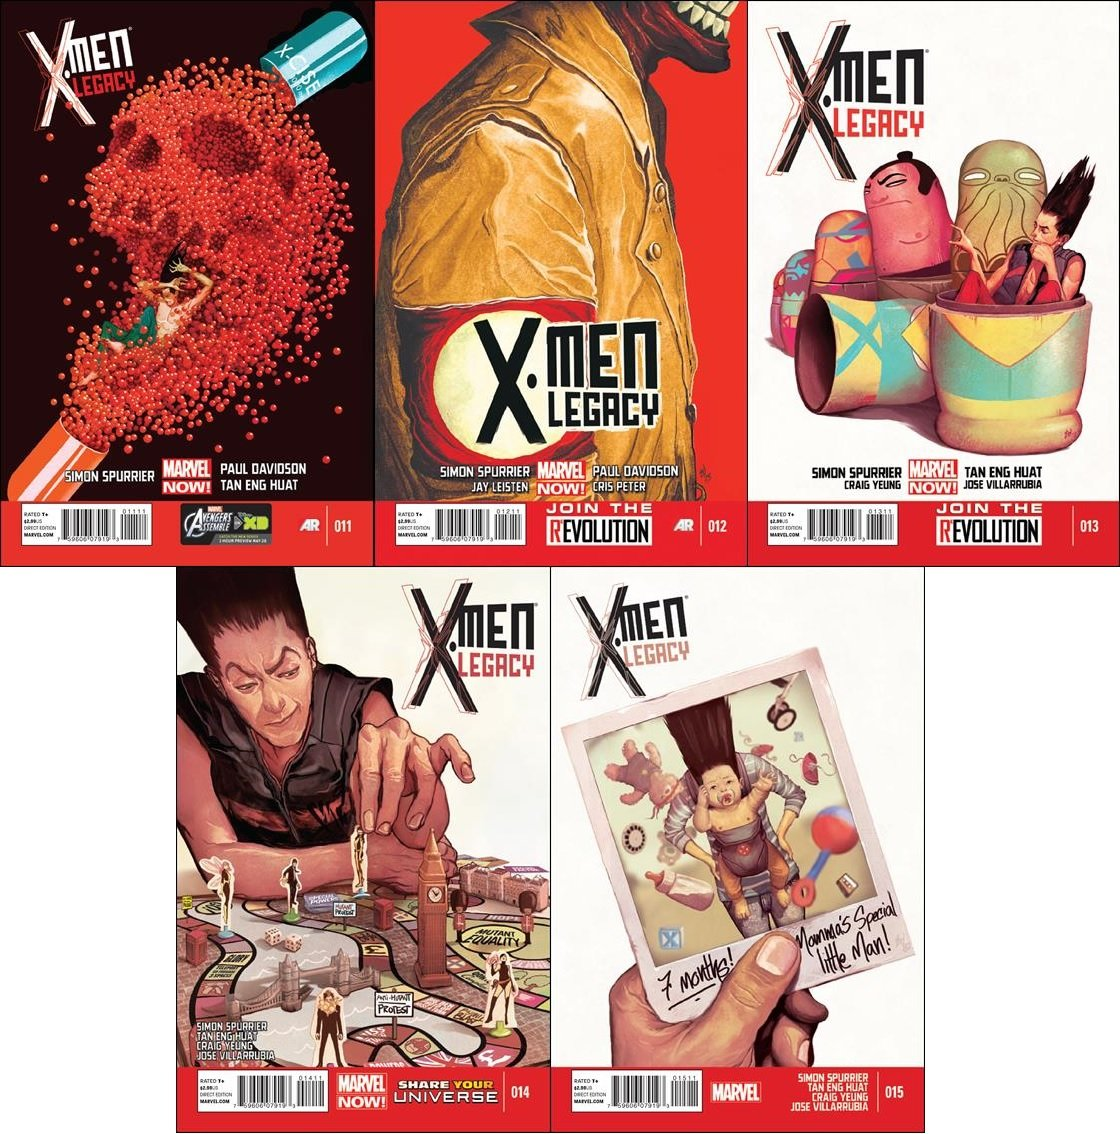 X-Men Legacy (Vol 2) #11 12 13 14 15 (2013) VF/NM *Trade Set*